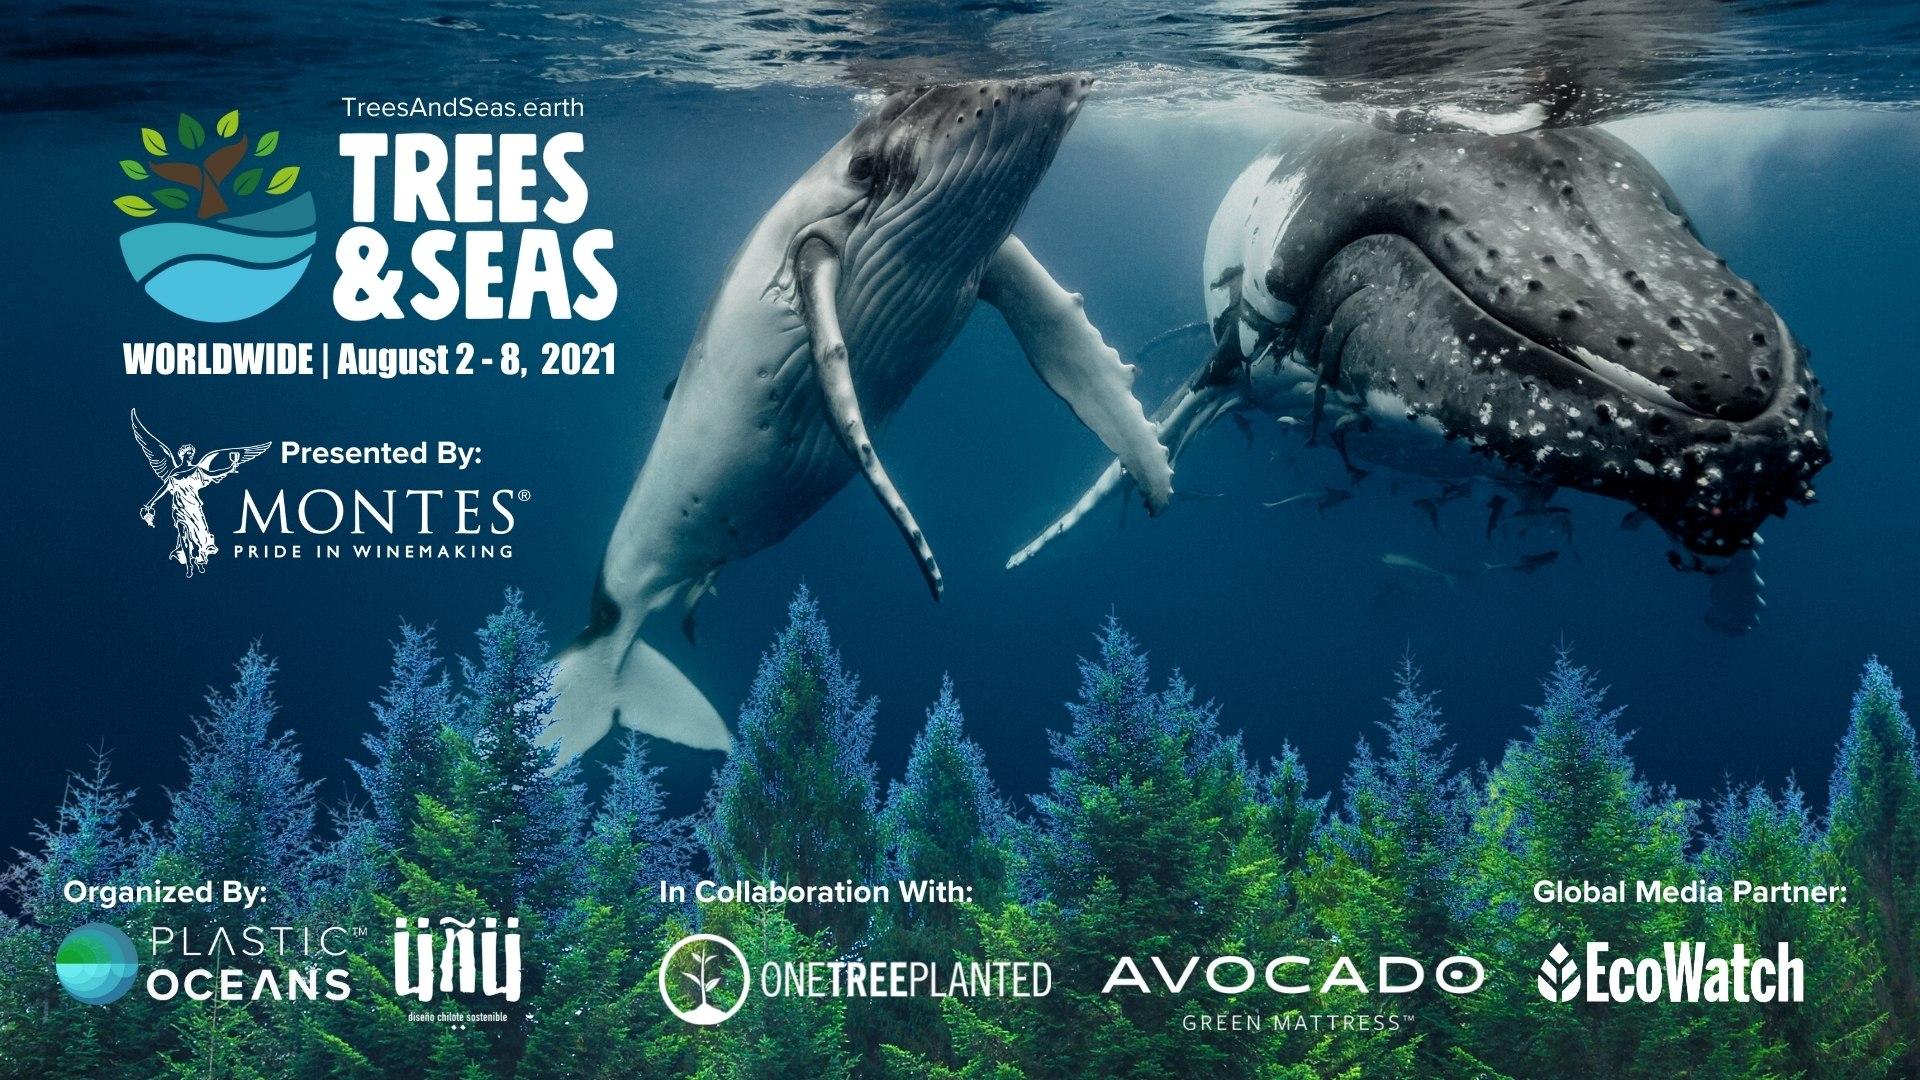 TREES-AND-SEAS_WEB-HOMEPAGE